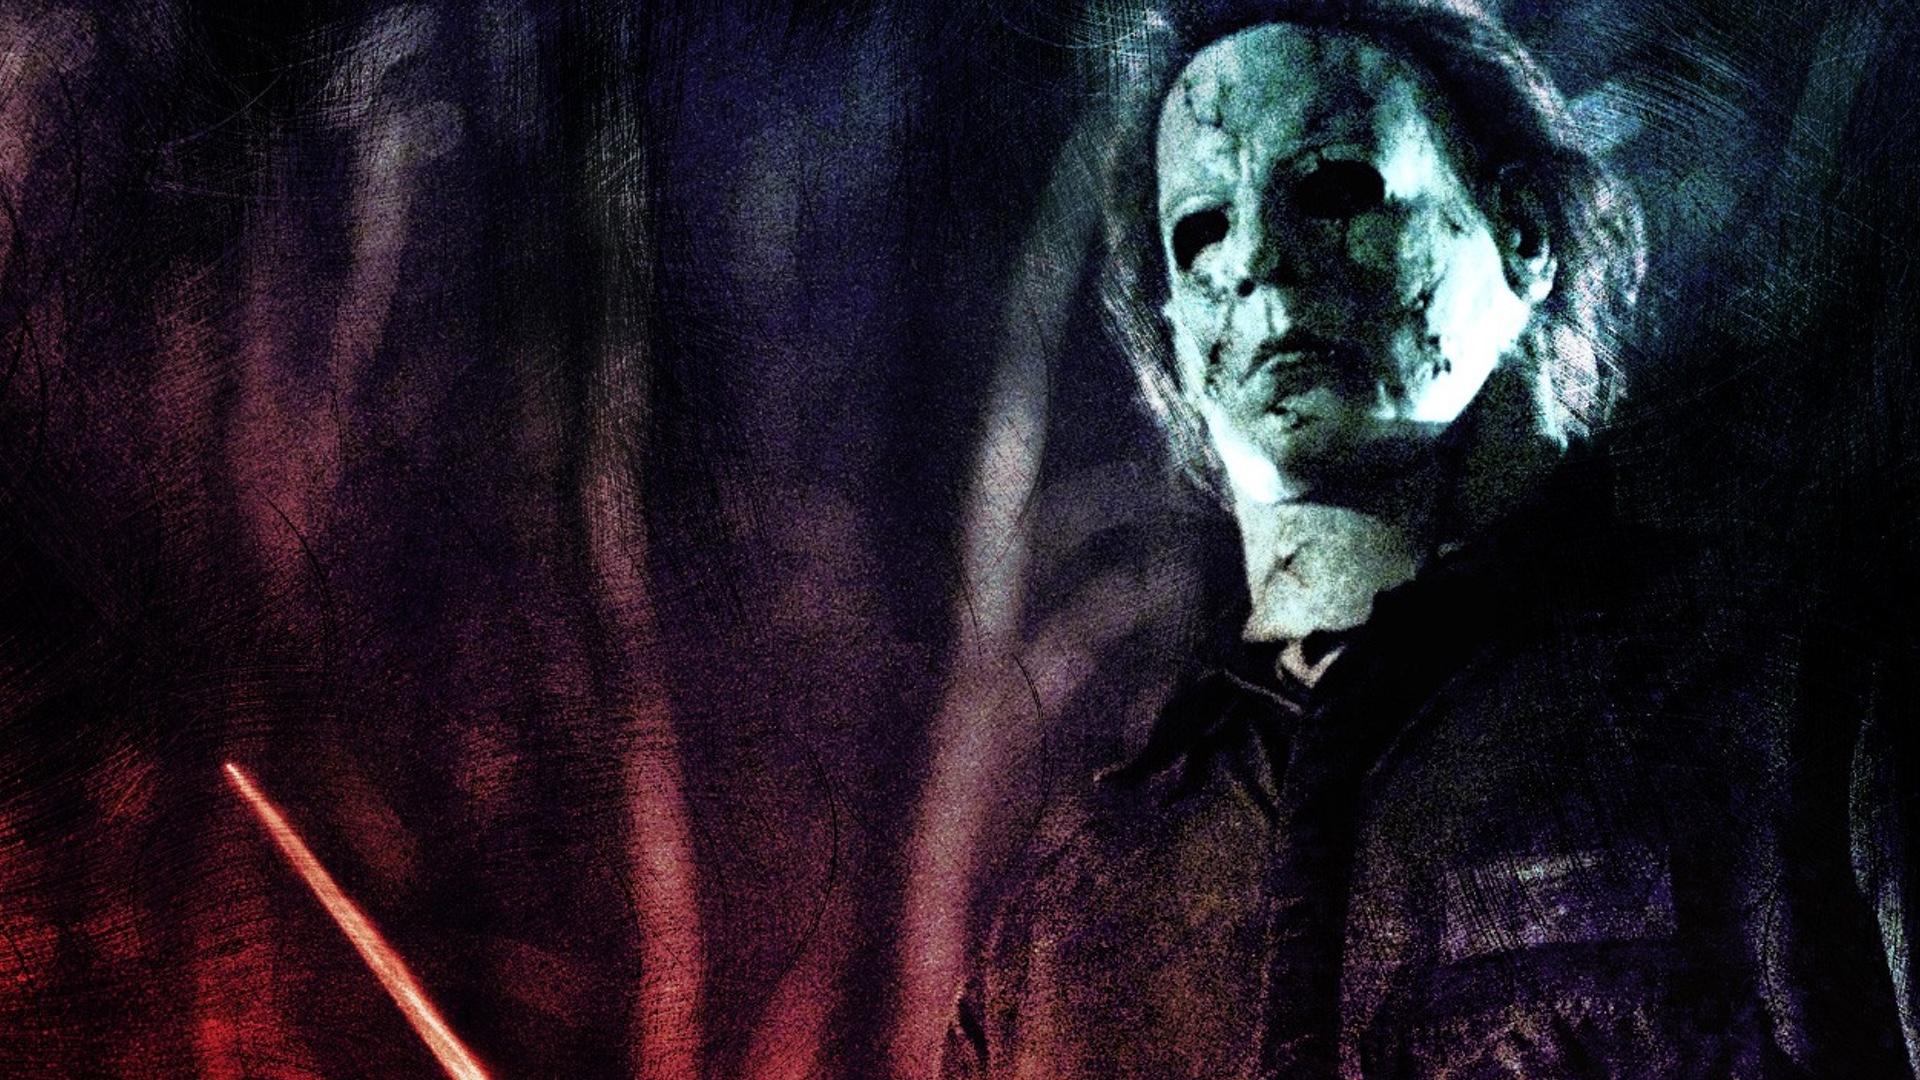 john carpenter explains why he disliked rob zombie's halloween